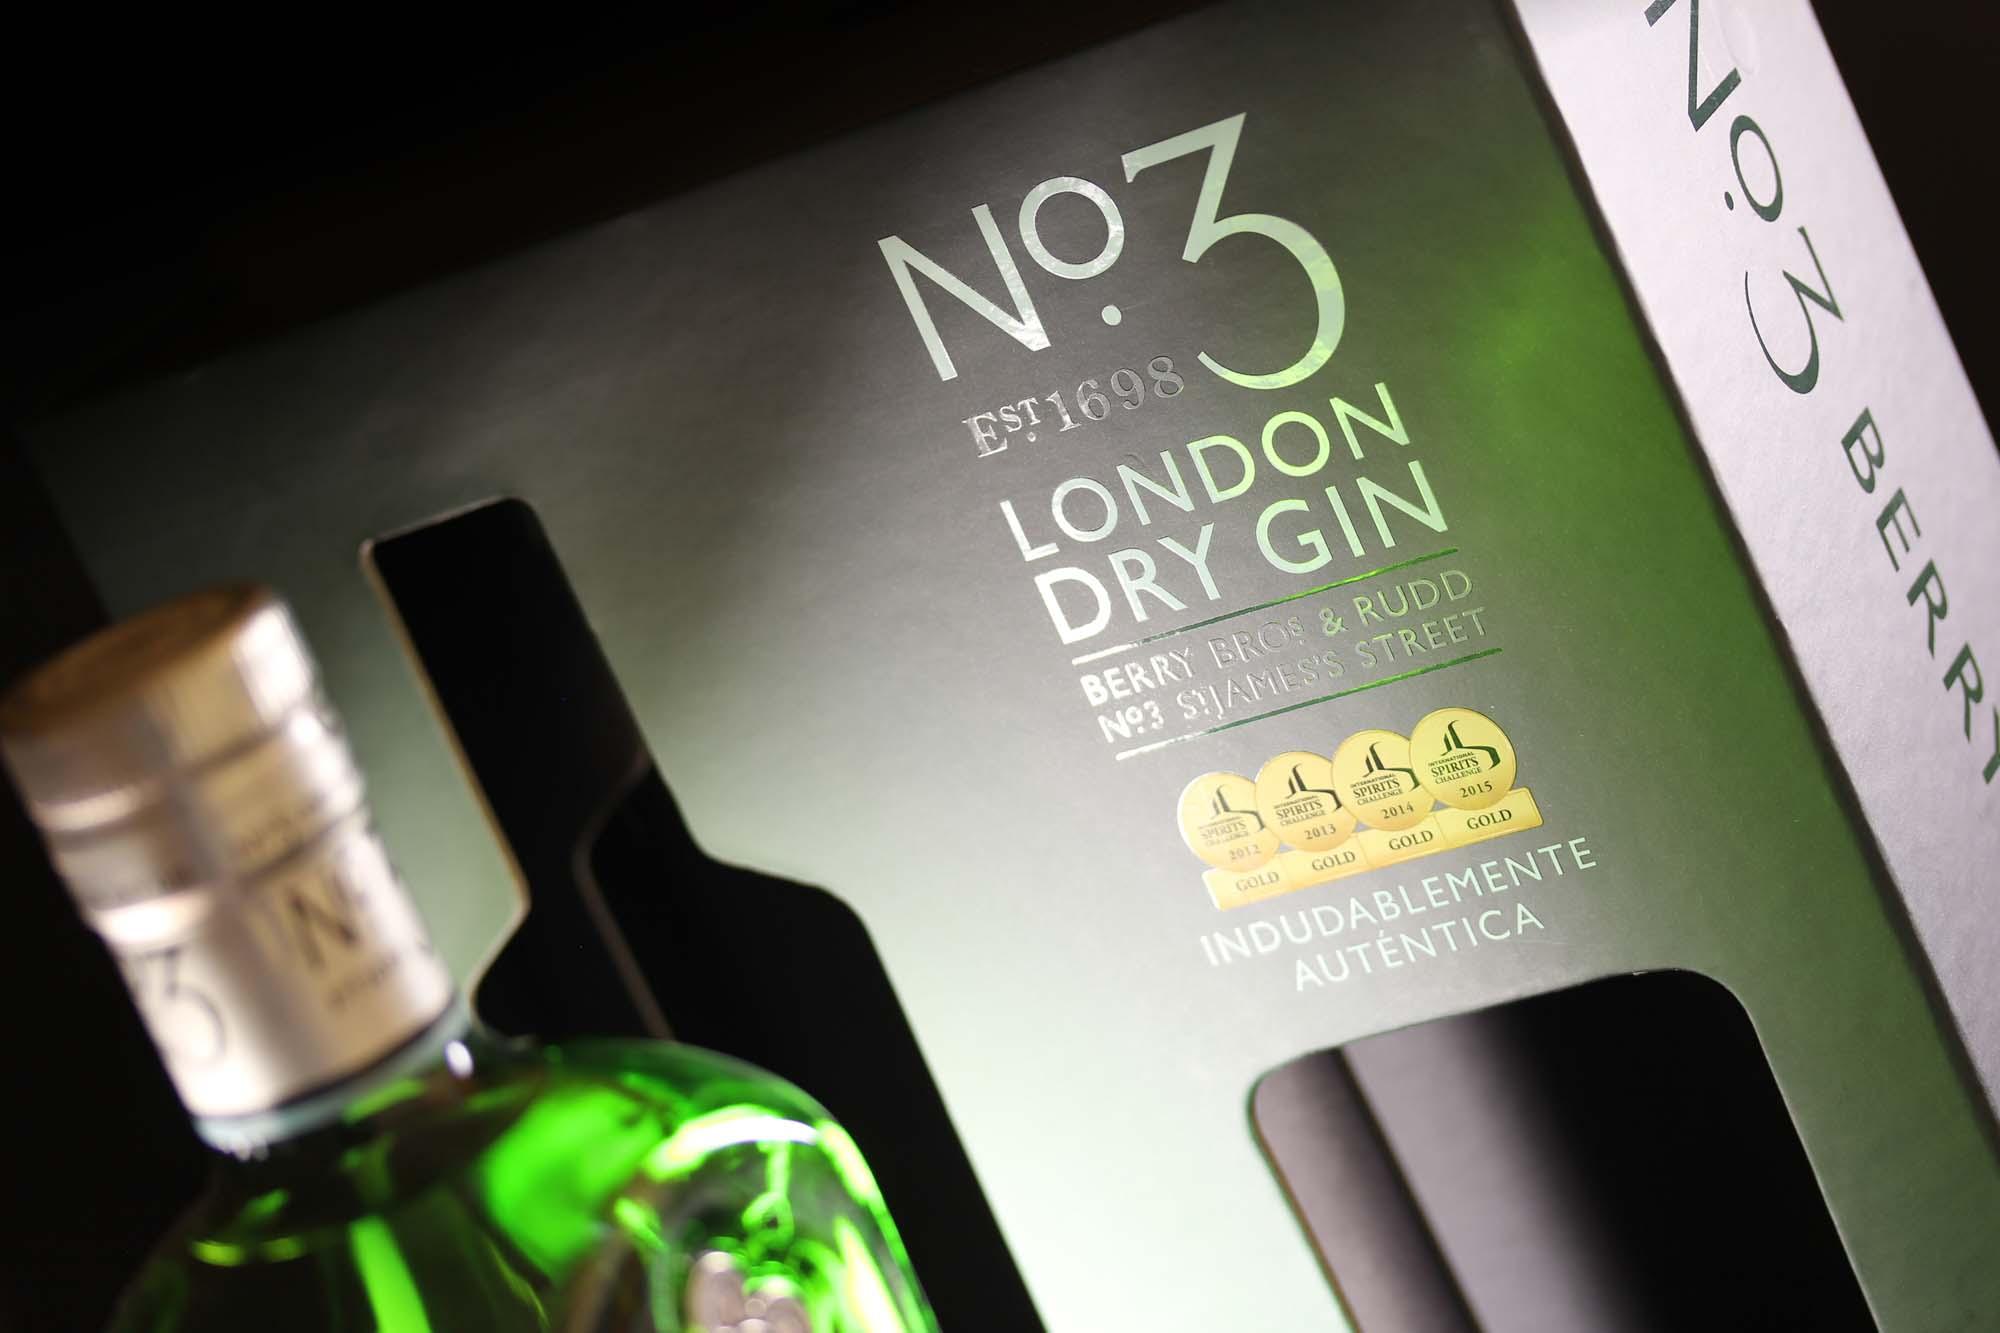 london no 3 gin